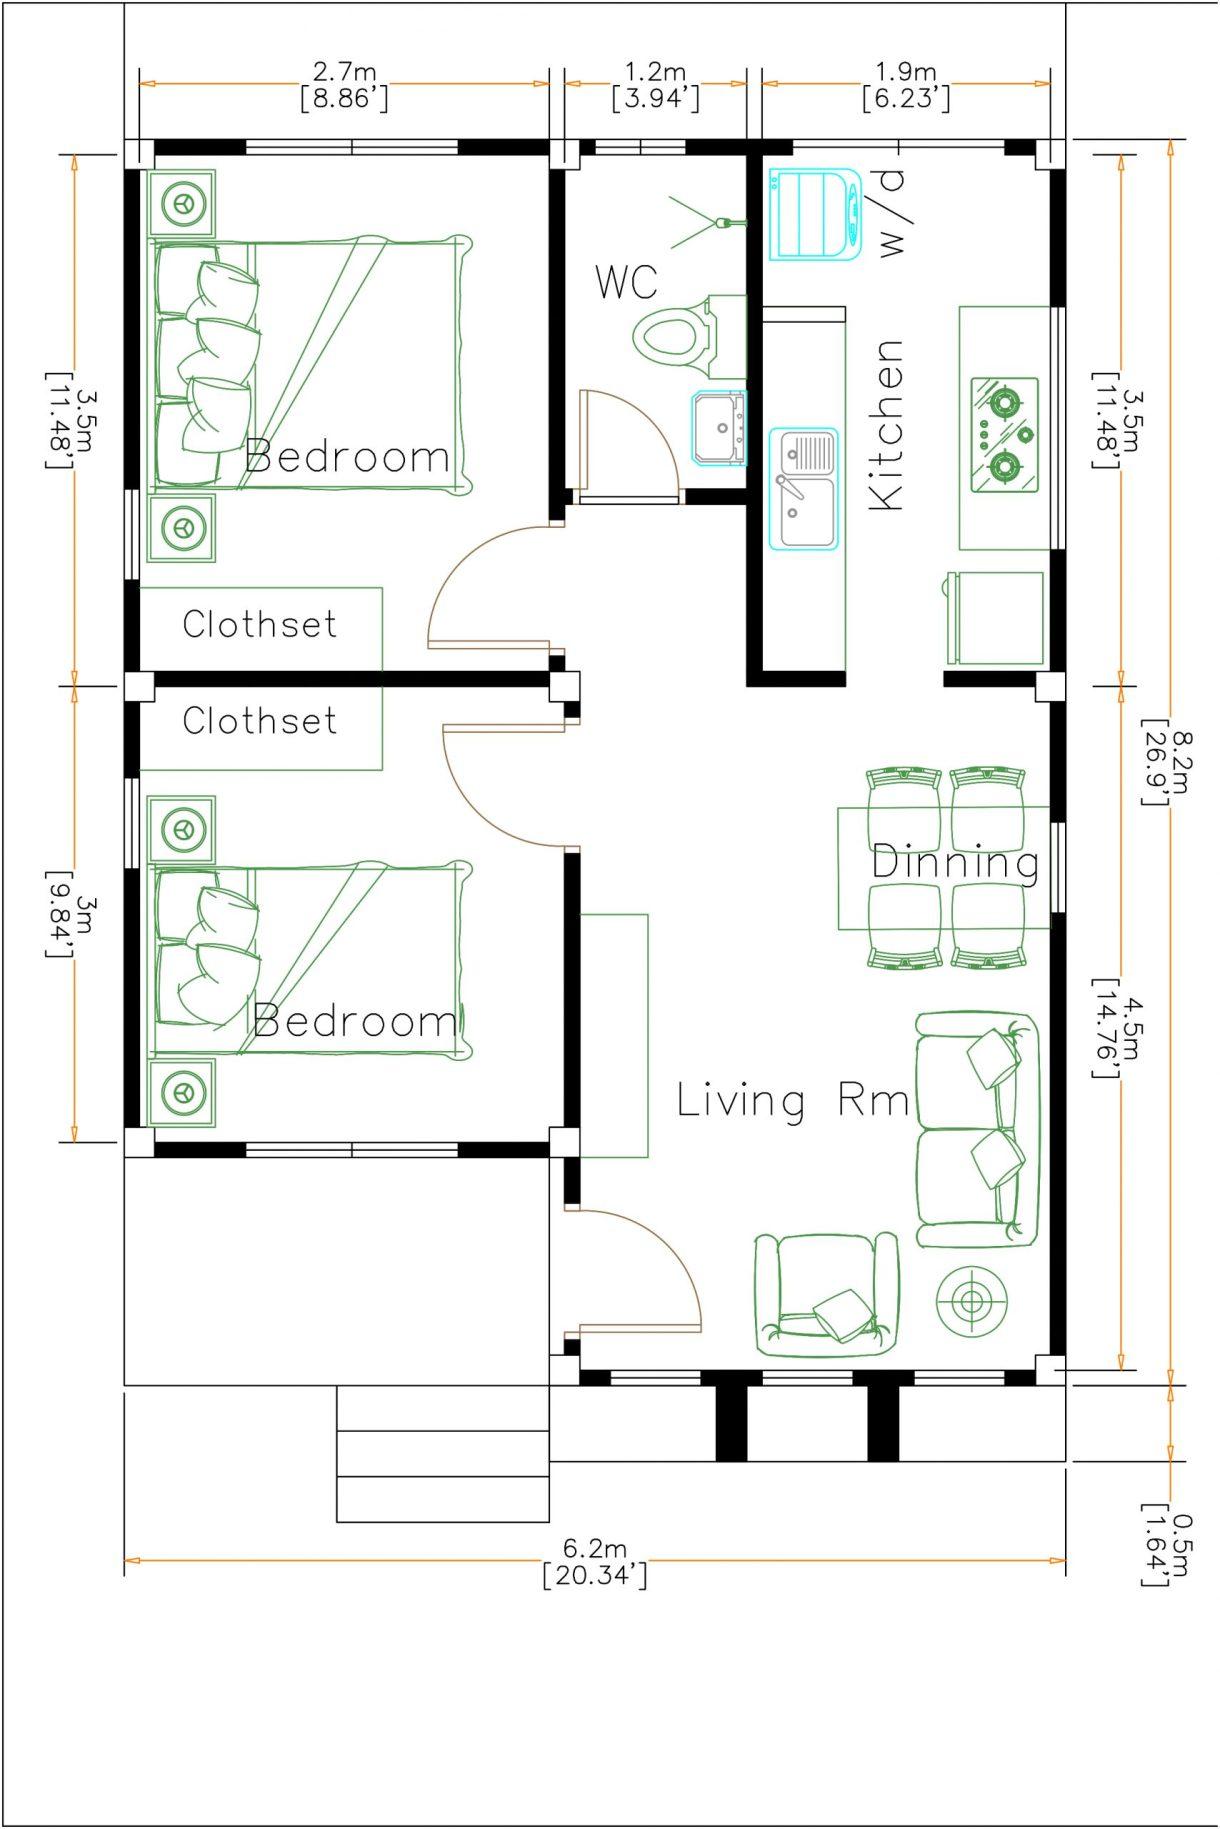 Small House Design 6x8 Meter 20x27 Feet Terrace Roof Layout floor plan